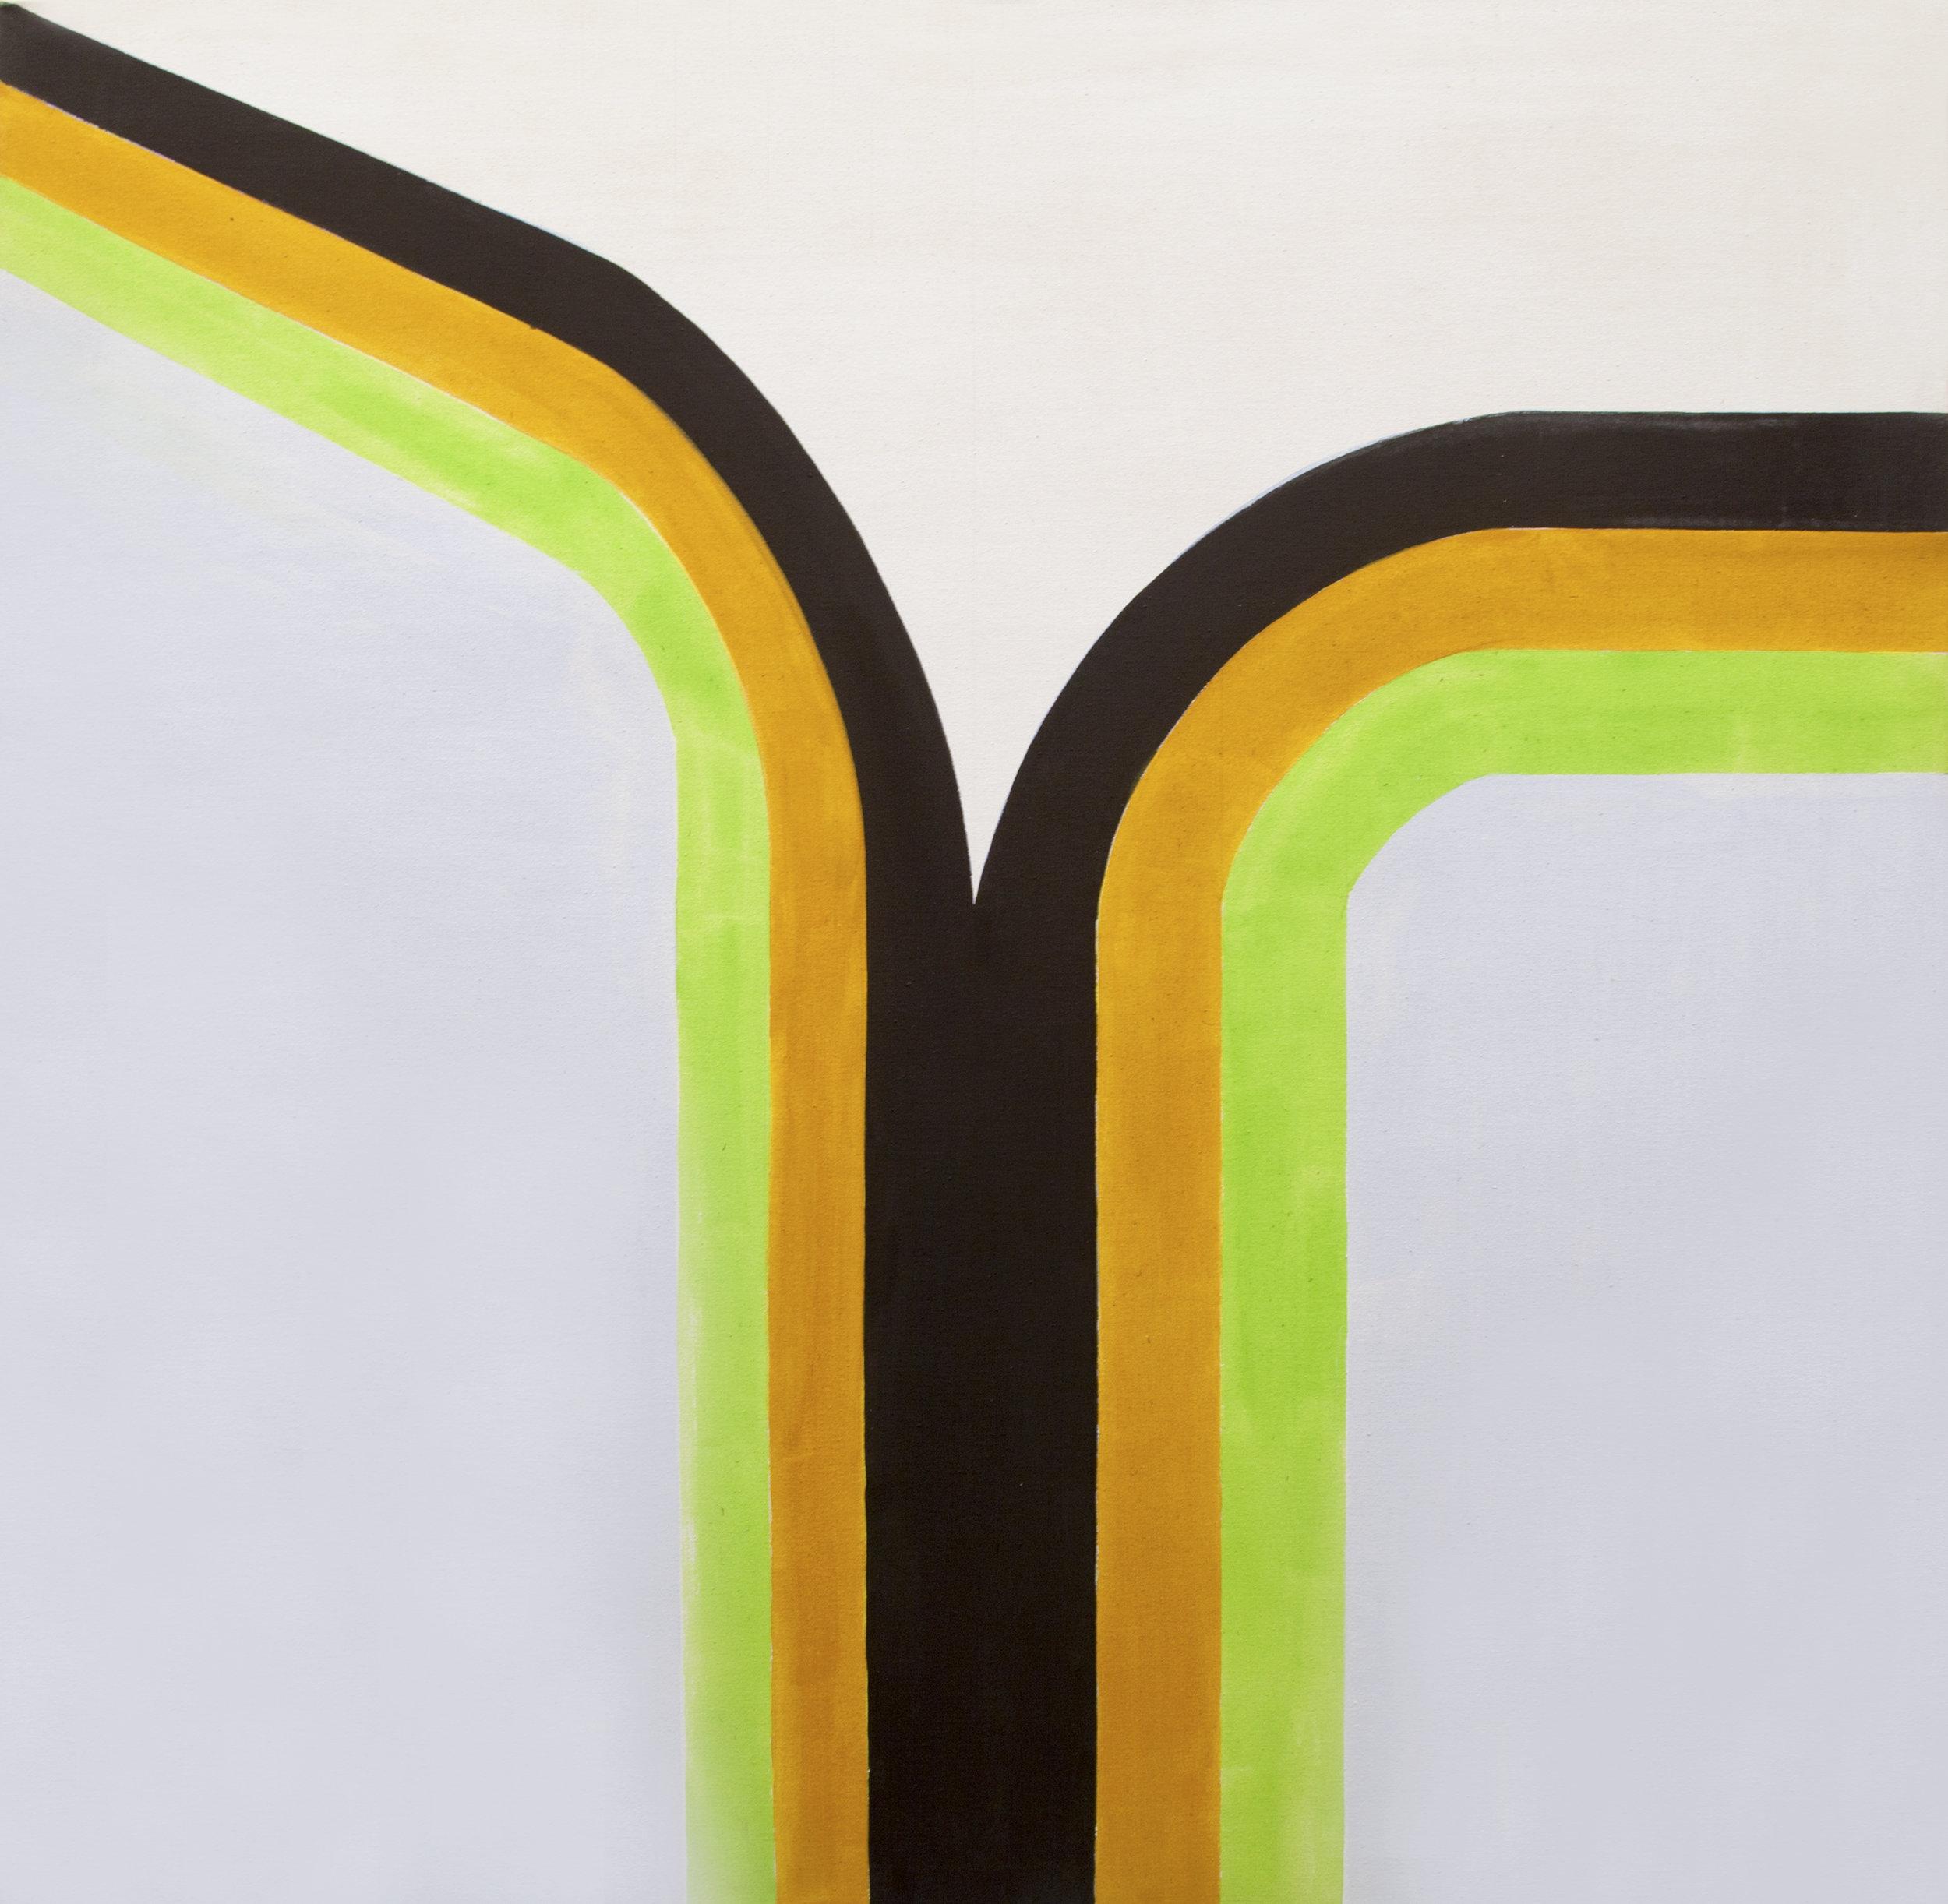 Richard Smith (1931–2016)   Four Corners 4 , 1965 acrylic on canvas  48 1/4 x 48 1/8 in. (122.6 x 122.2 cm) LSFA# 14073